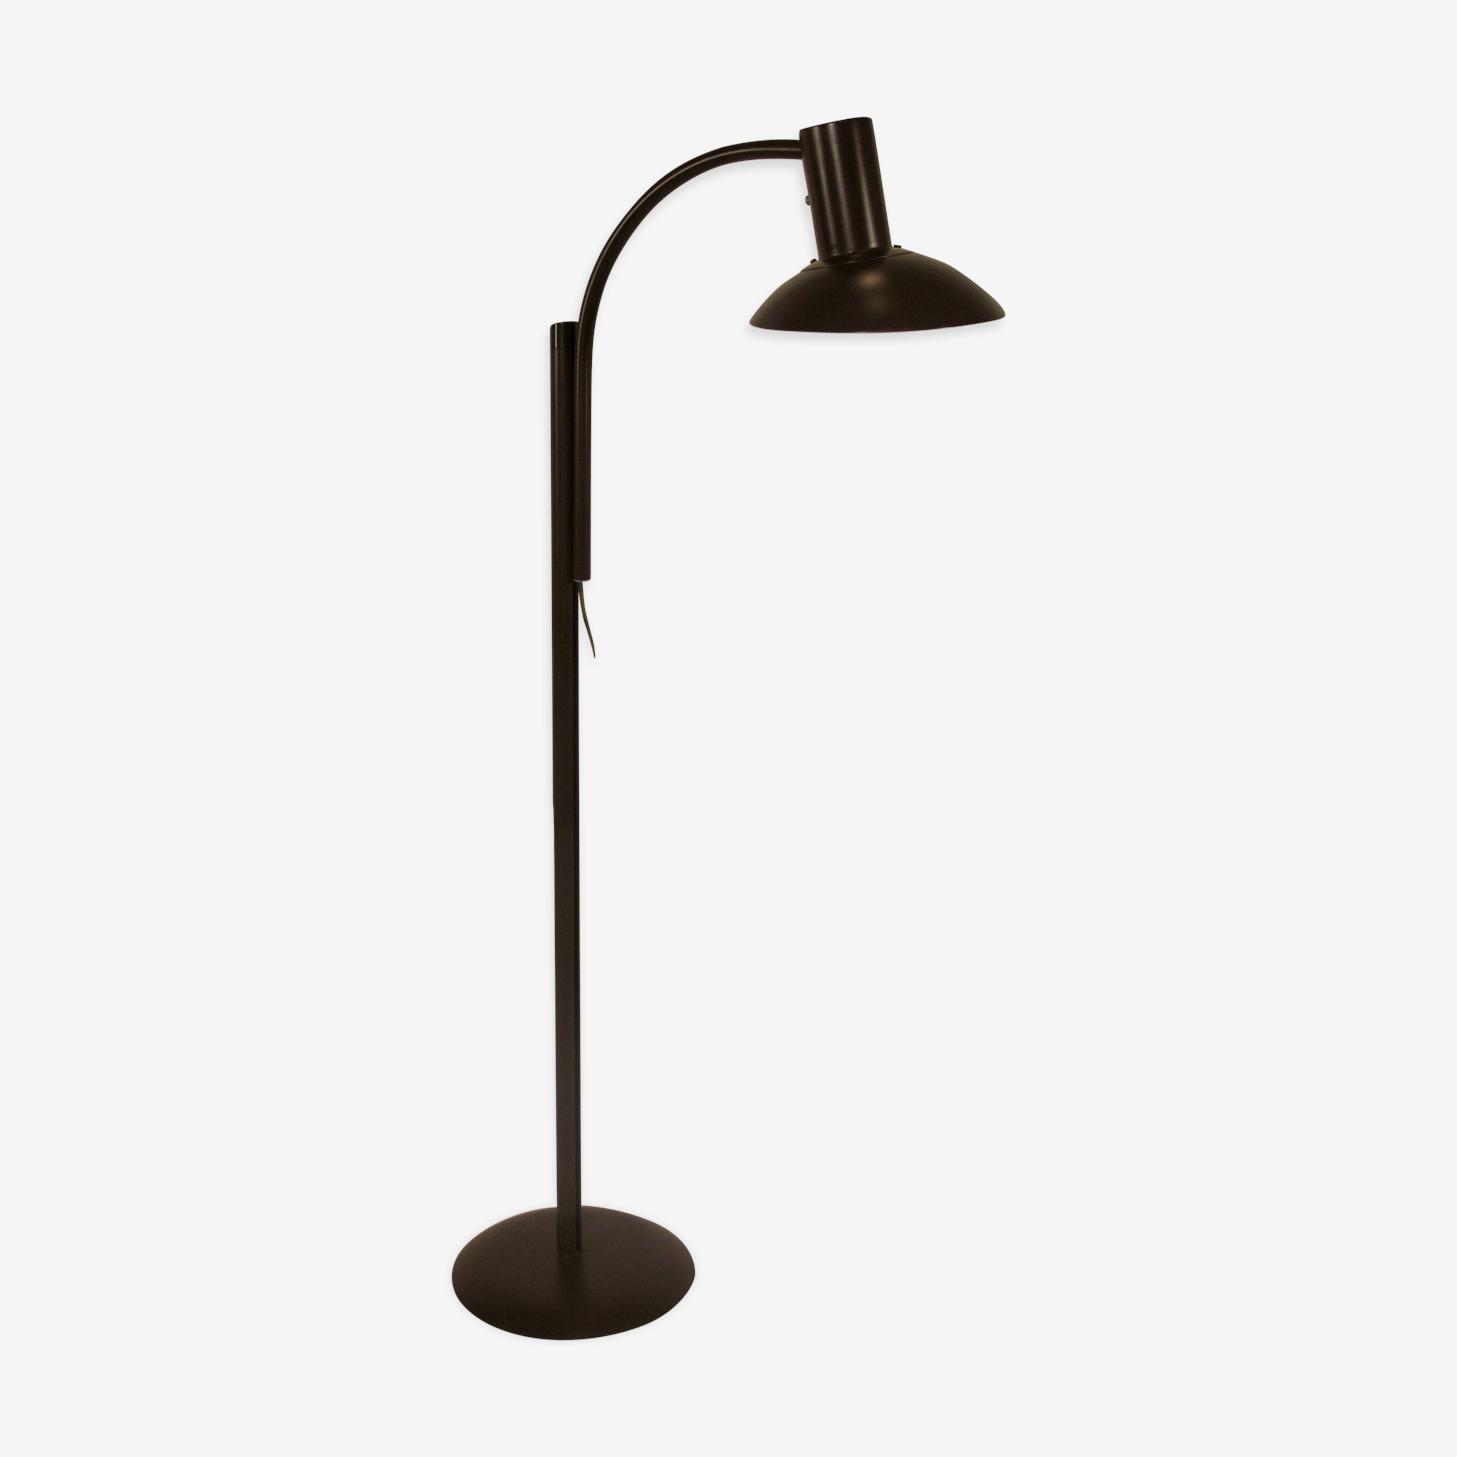 Adjustable floor lamp, Fog & Morup, Denmark 1960's